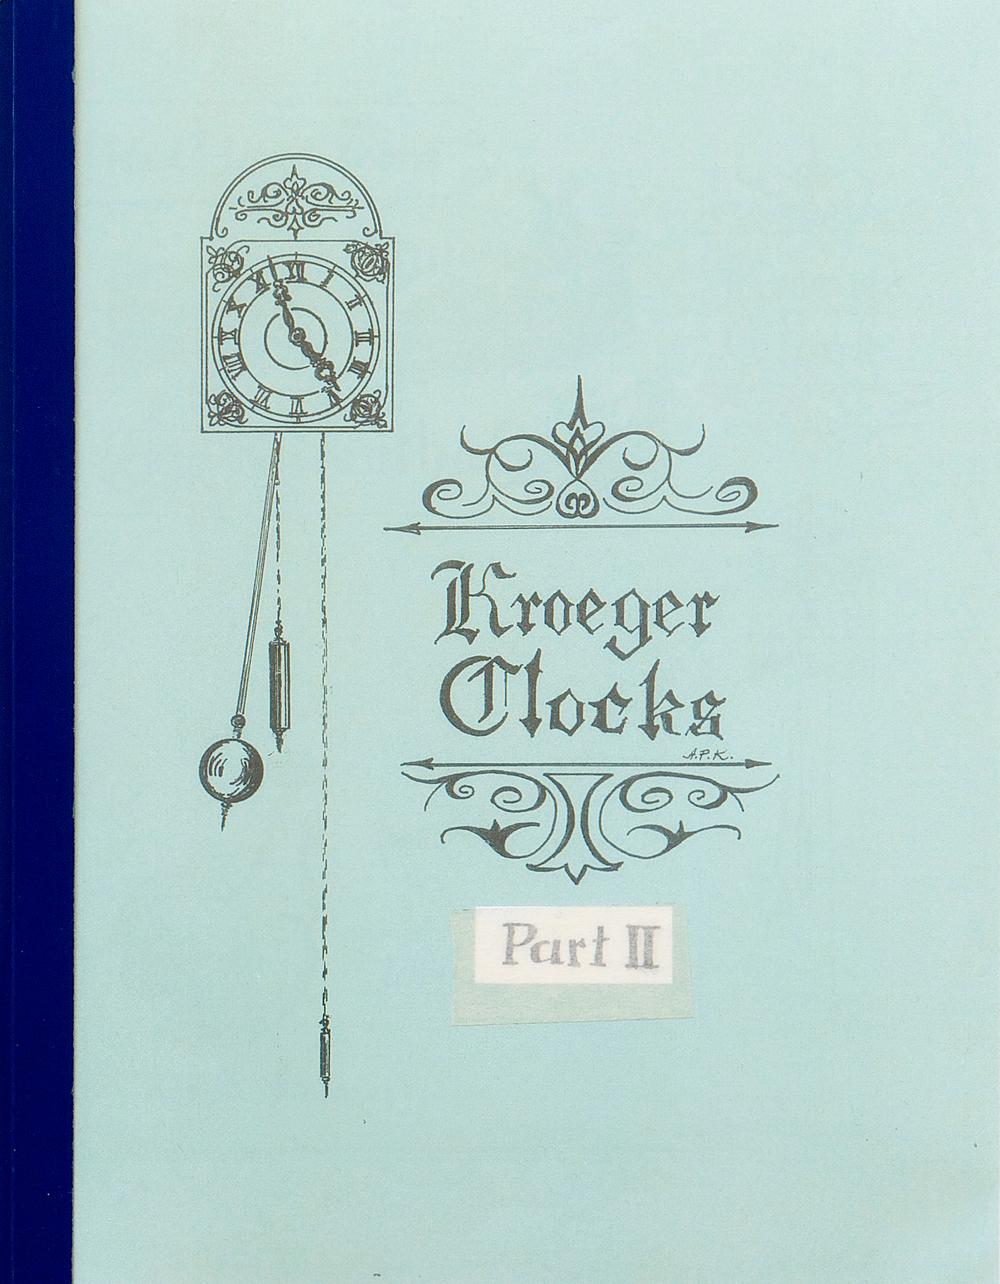 ClockCoverB&A.jpg